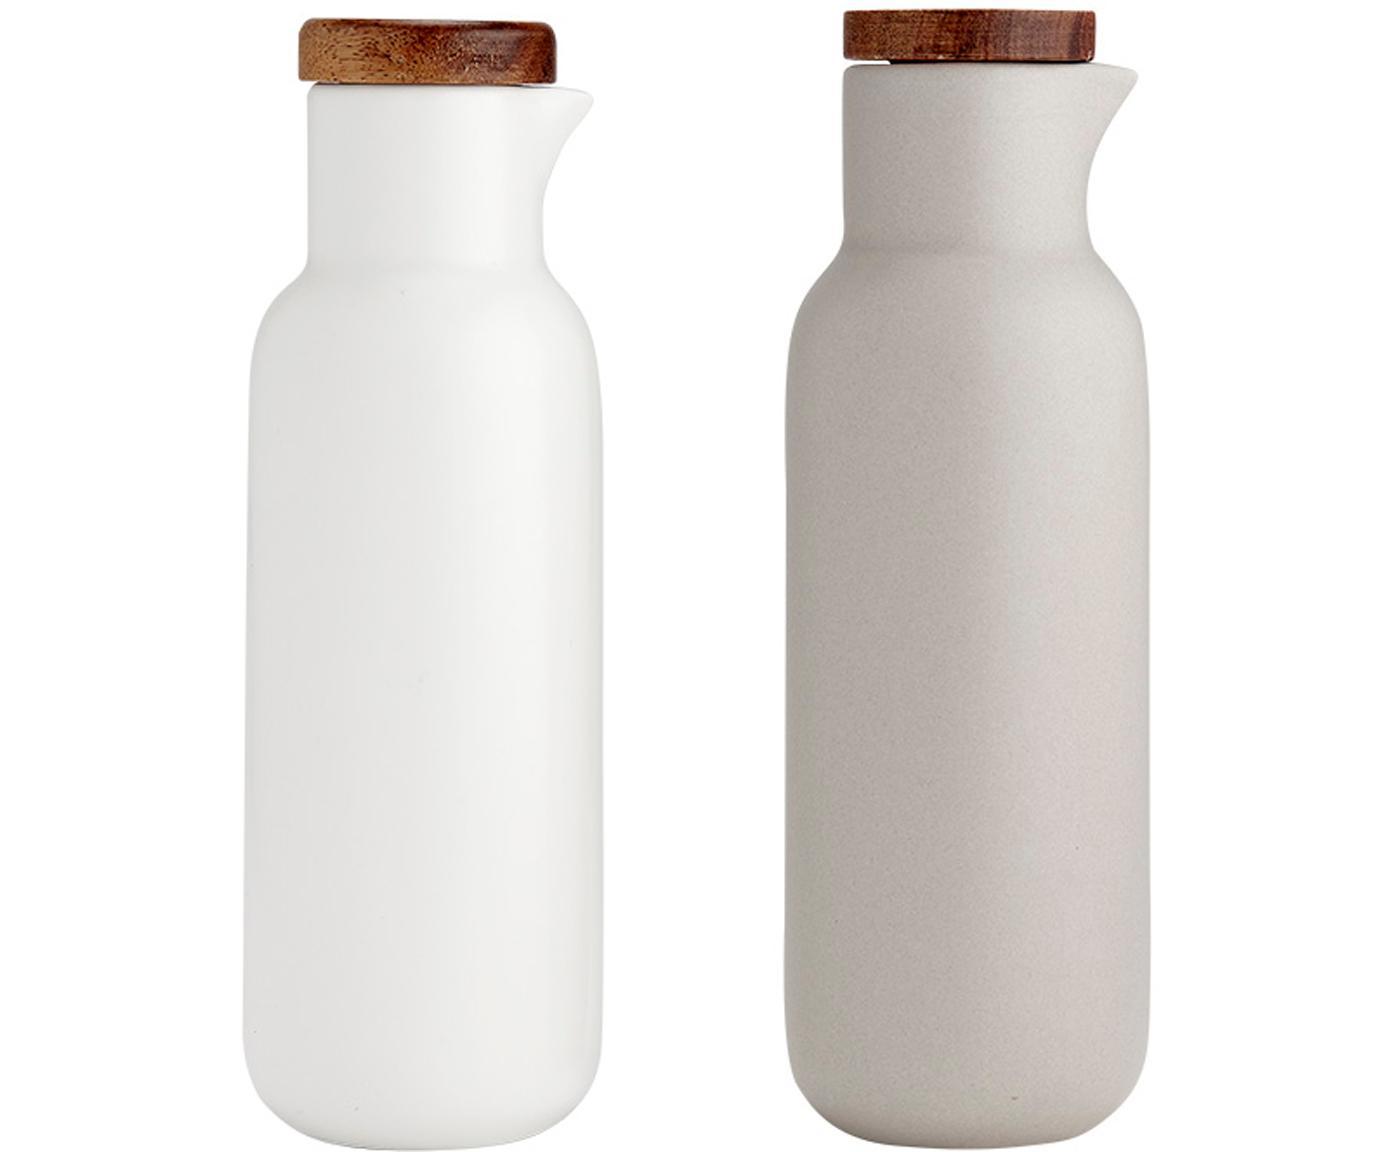 Set aceto e olio Essentials 2 pz, Porcellana, legno d'acacia, Sabbia, bianco, legno di acacia, Ø 6 x Alt. 18 cm